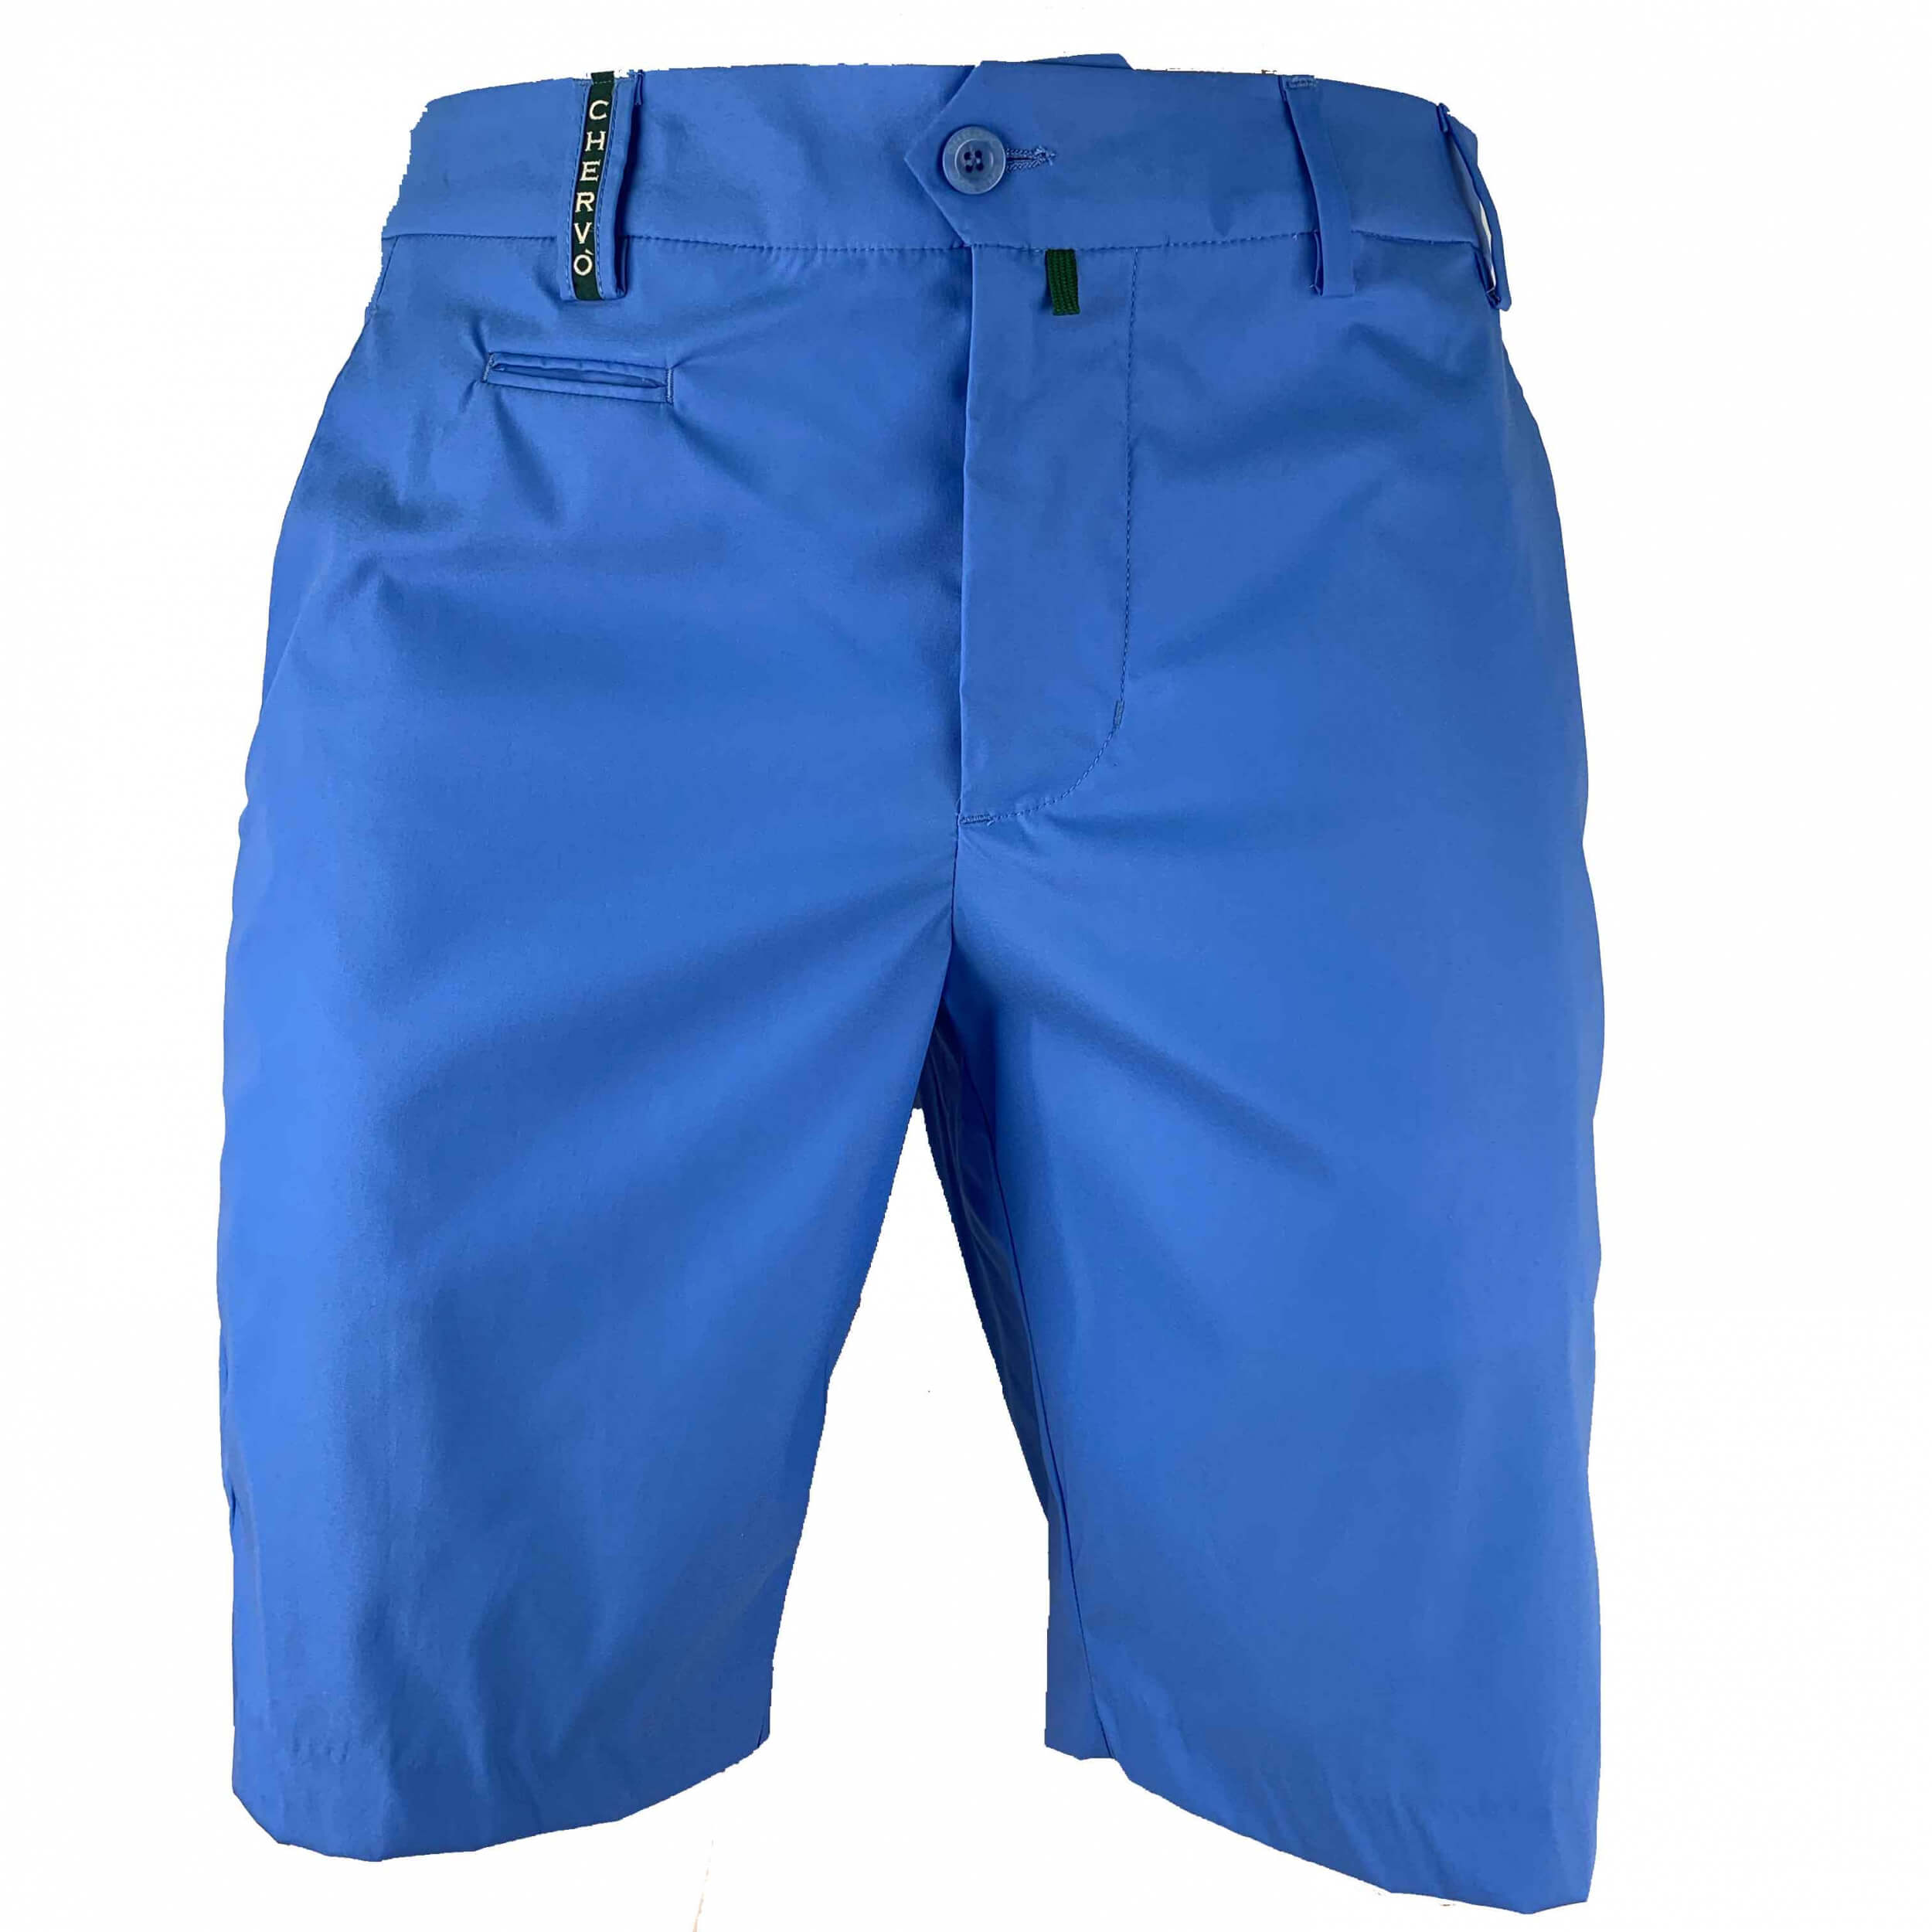 ad3c79ee17432 Details zu Chervo Golf Herren Short kurze Hose DRY MATIC Garcia blau 532  2.Wahl